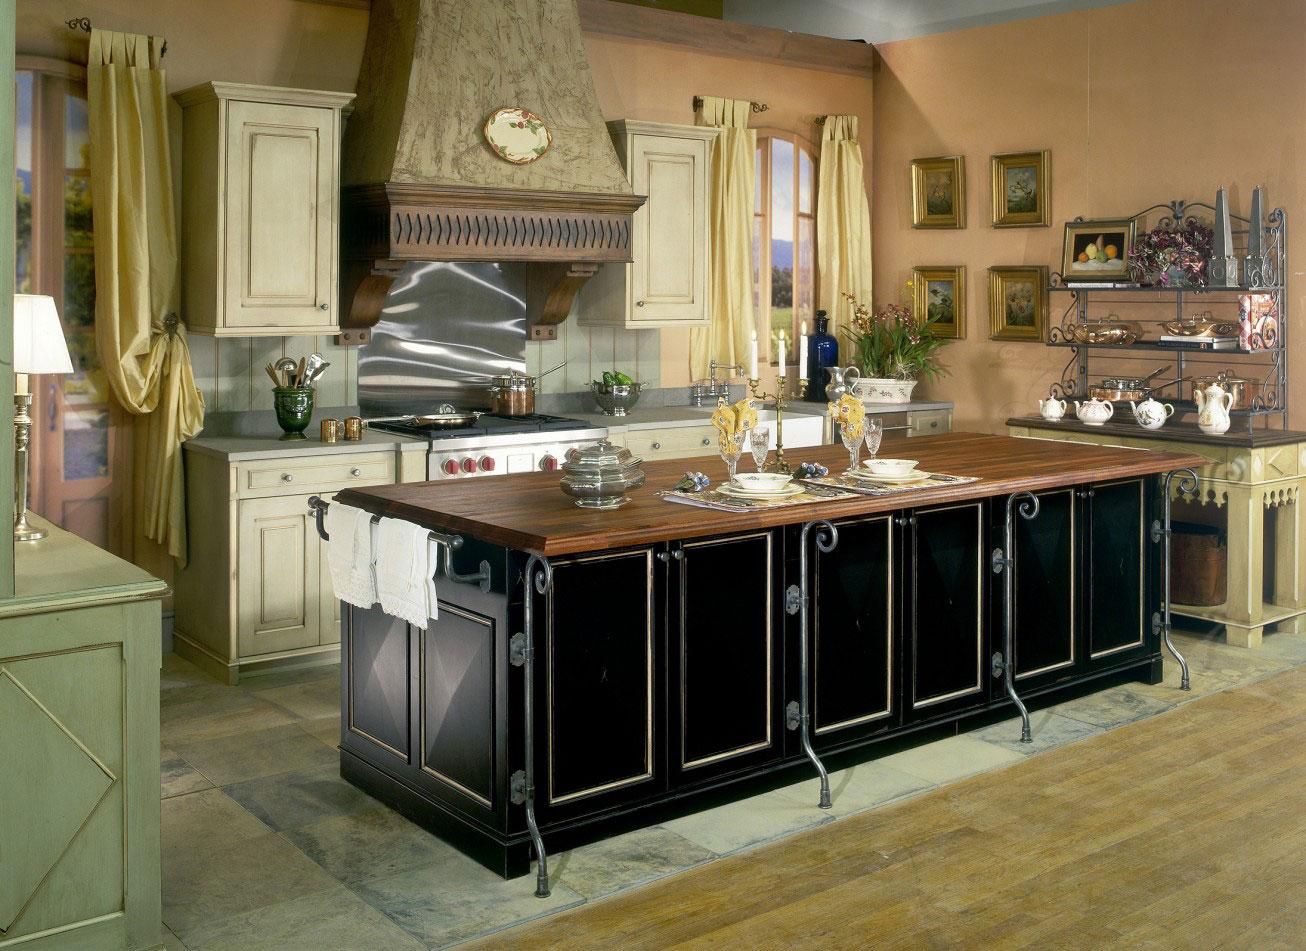 Southwestern-interior-design-style-and-decoration-ideas-3 Southwestern interior design, style and decoration ideas